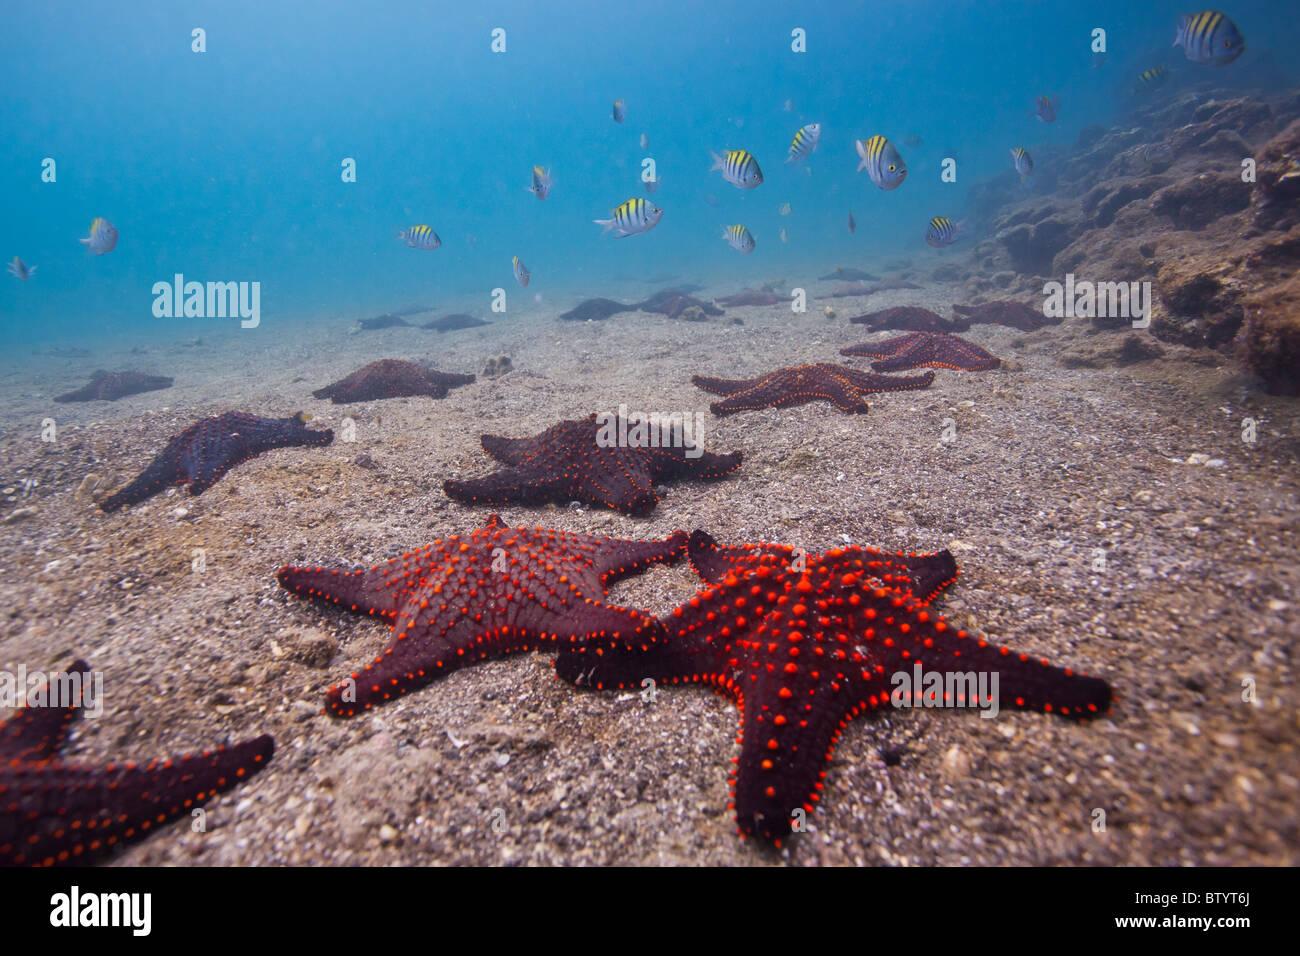 Colorful sea stars on the ocean floor, Bartolome Island, Galapagos Islands, Ecuador Stock Photo